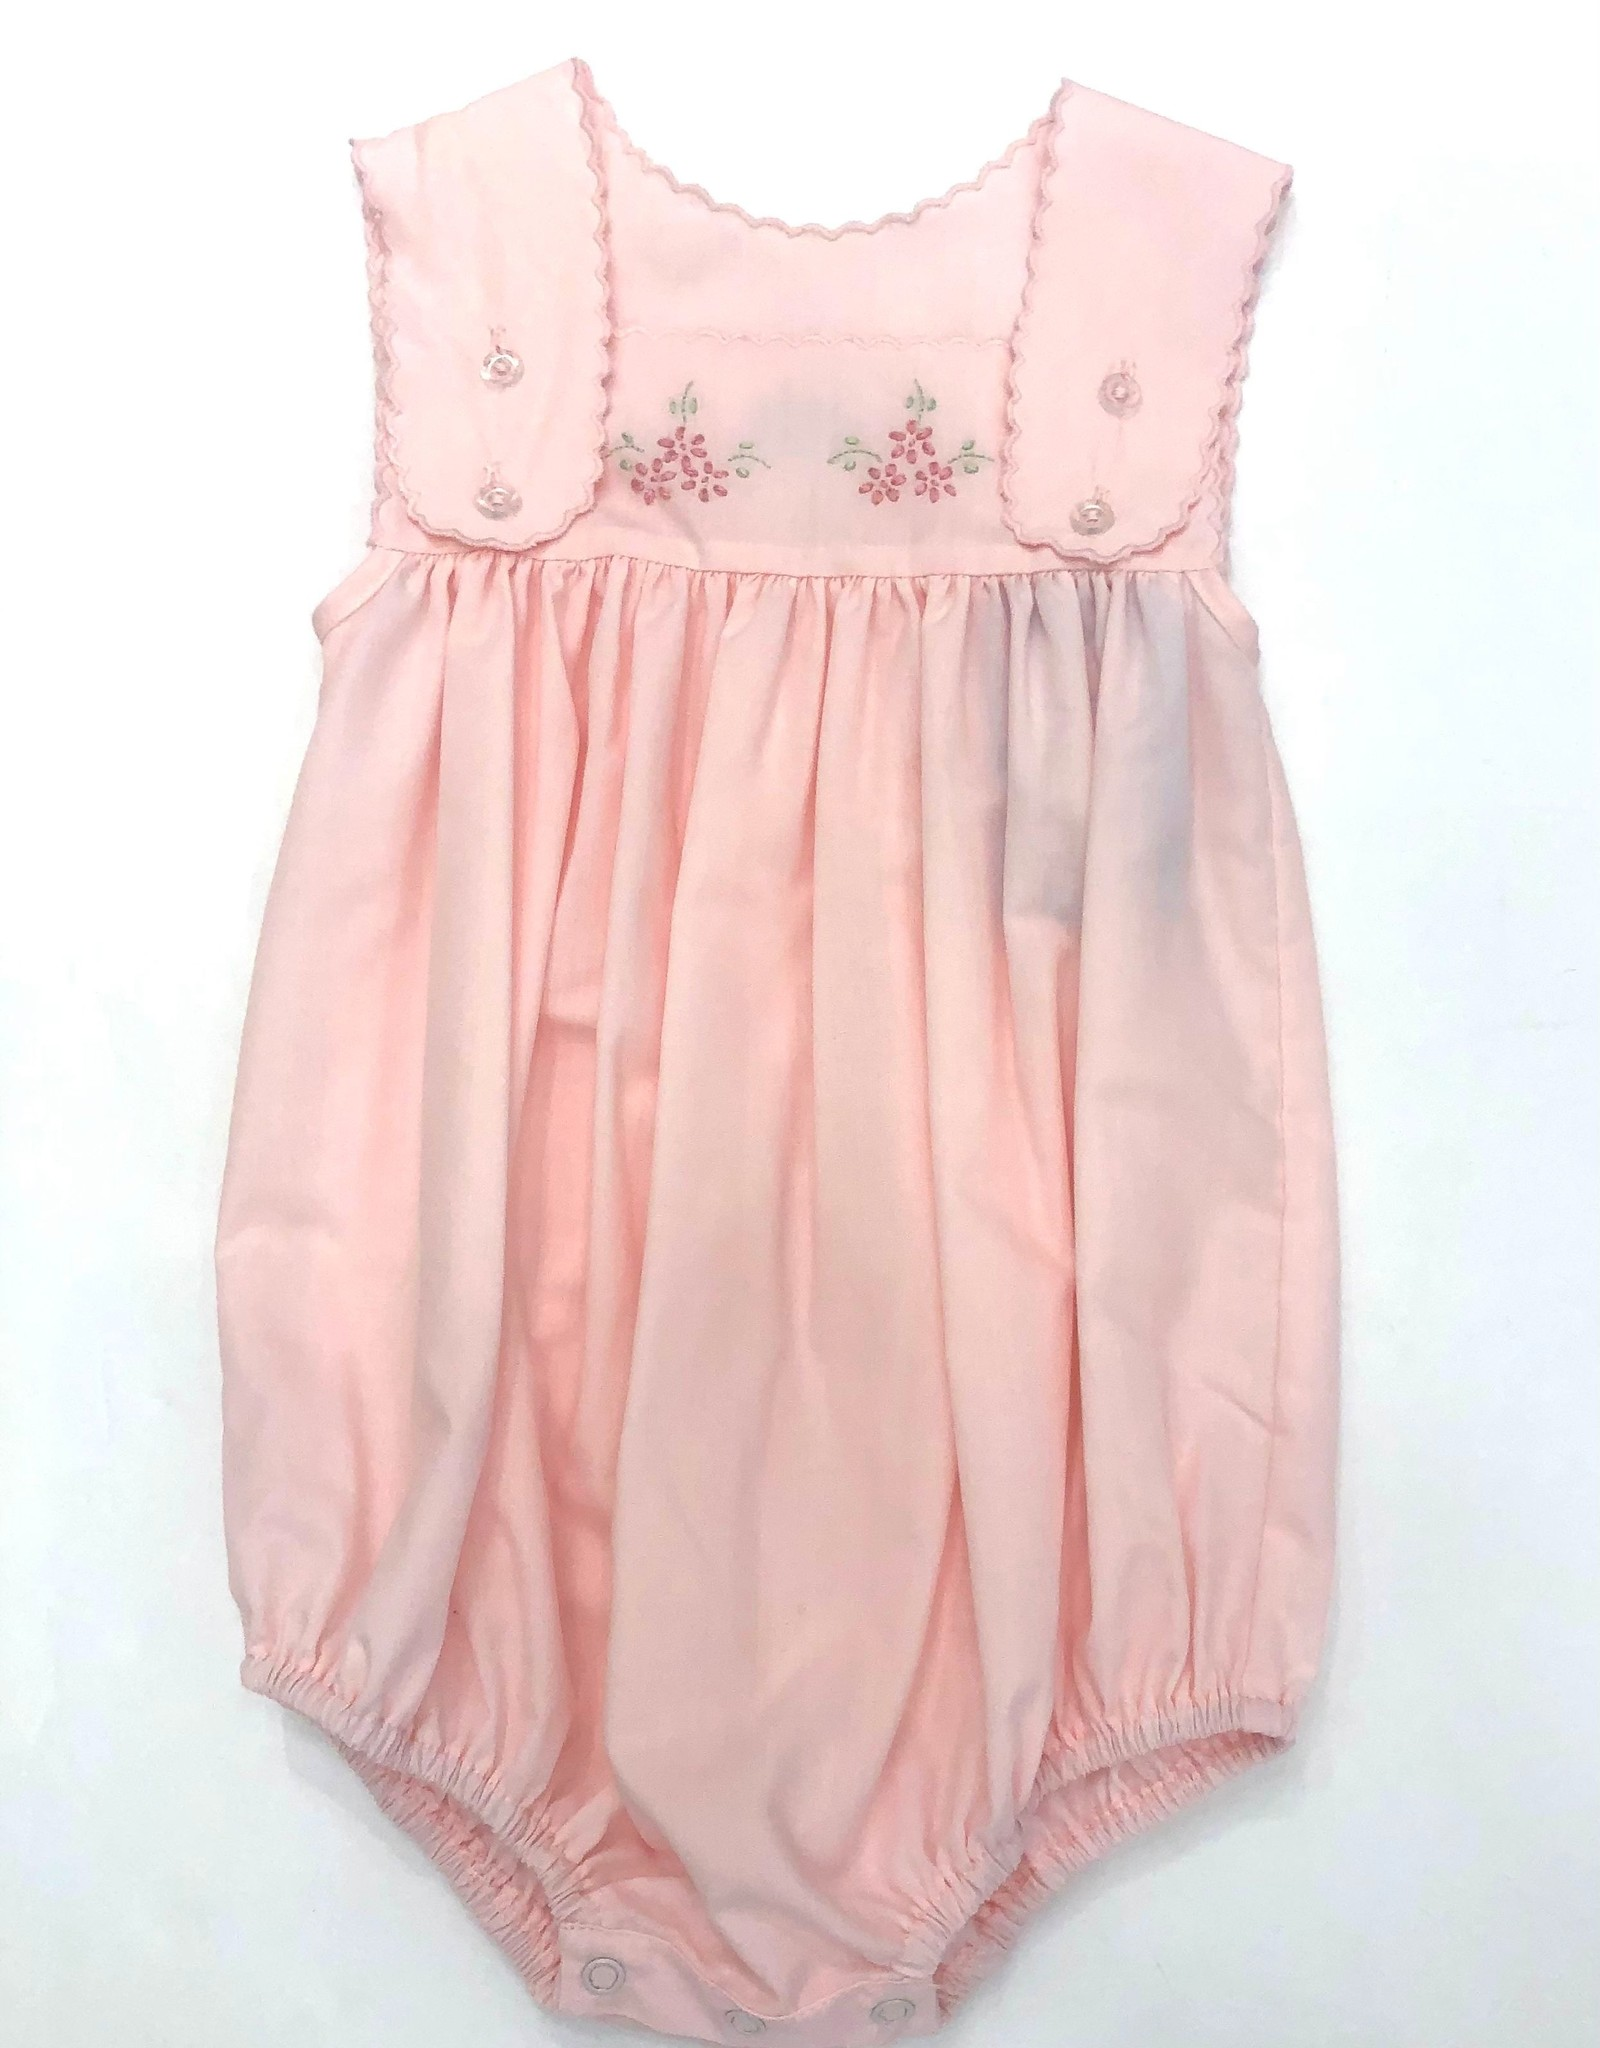 Auraluz Pink Bubble w/ Flower Embroidery